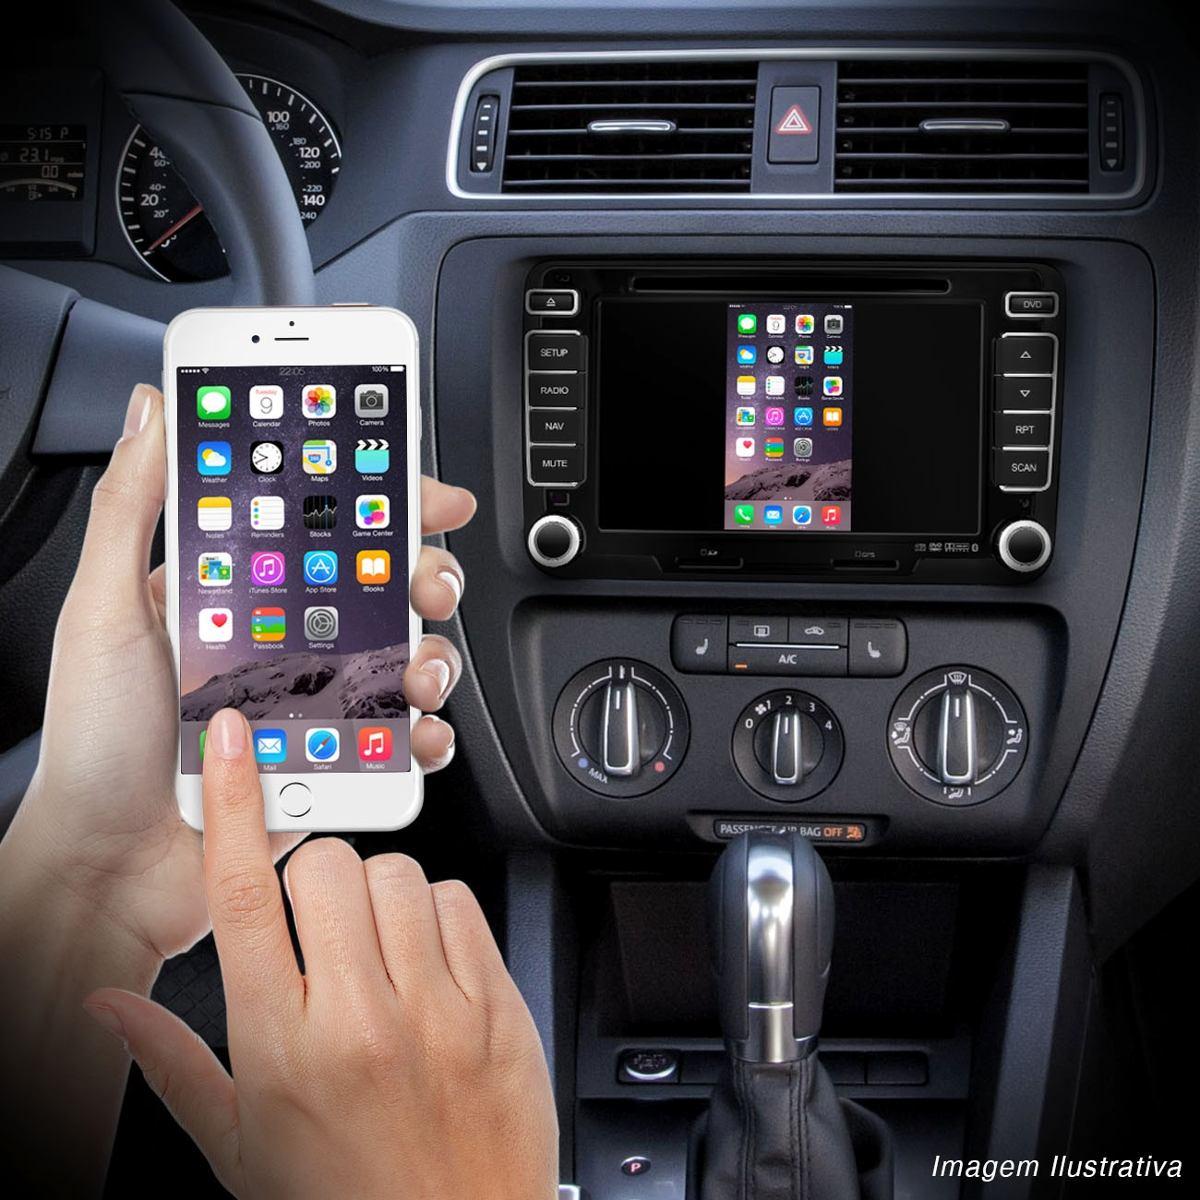 Mirror Cast Espelhamento Iphone E Android Dvd Carro Wi-fi Multilaser - SONNIC SOUND